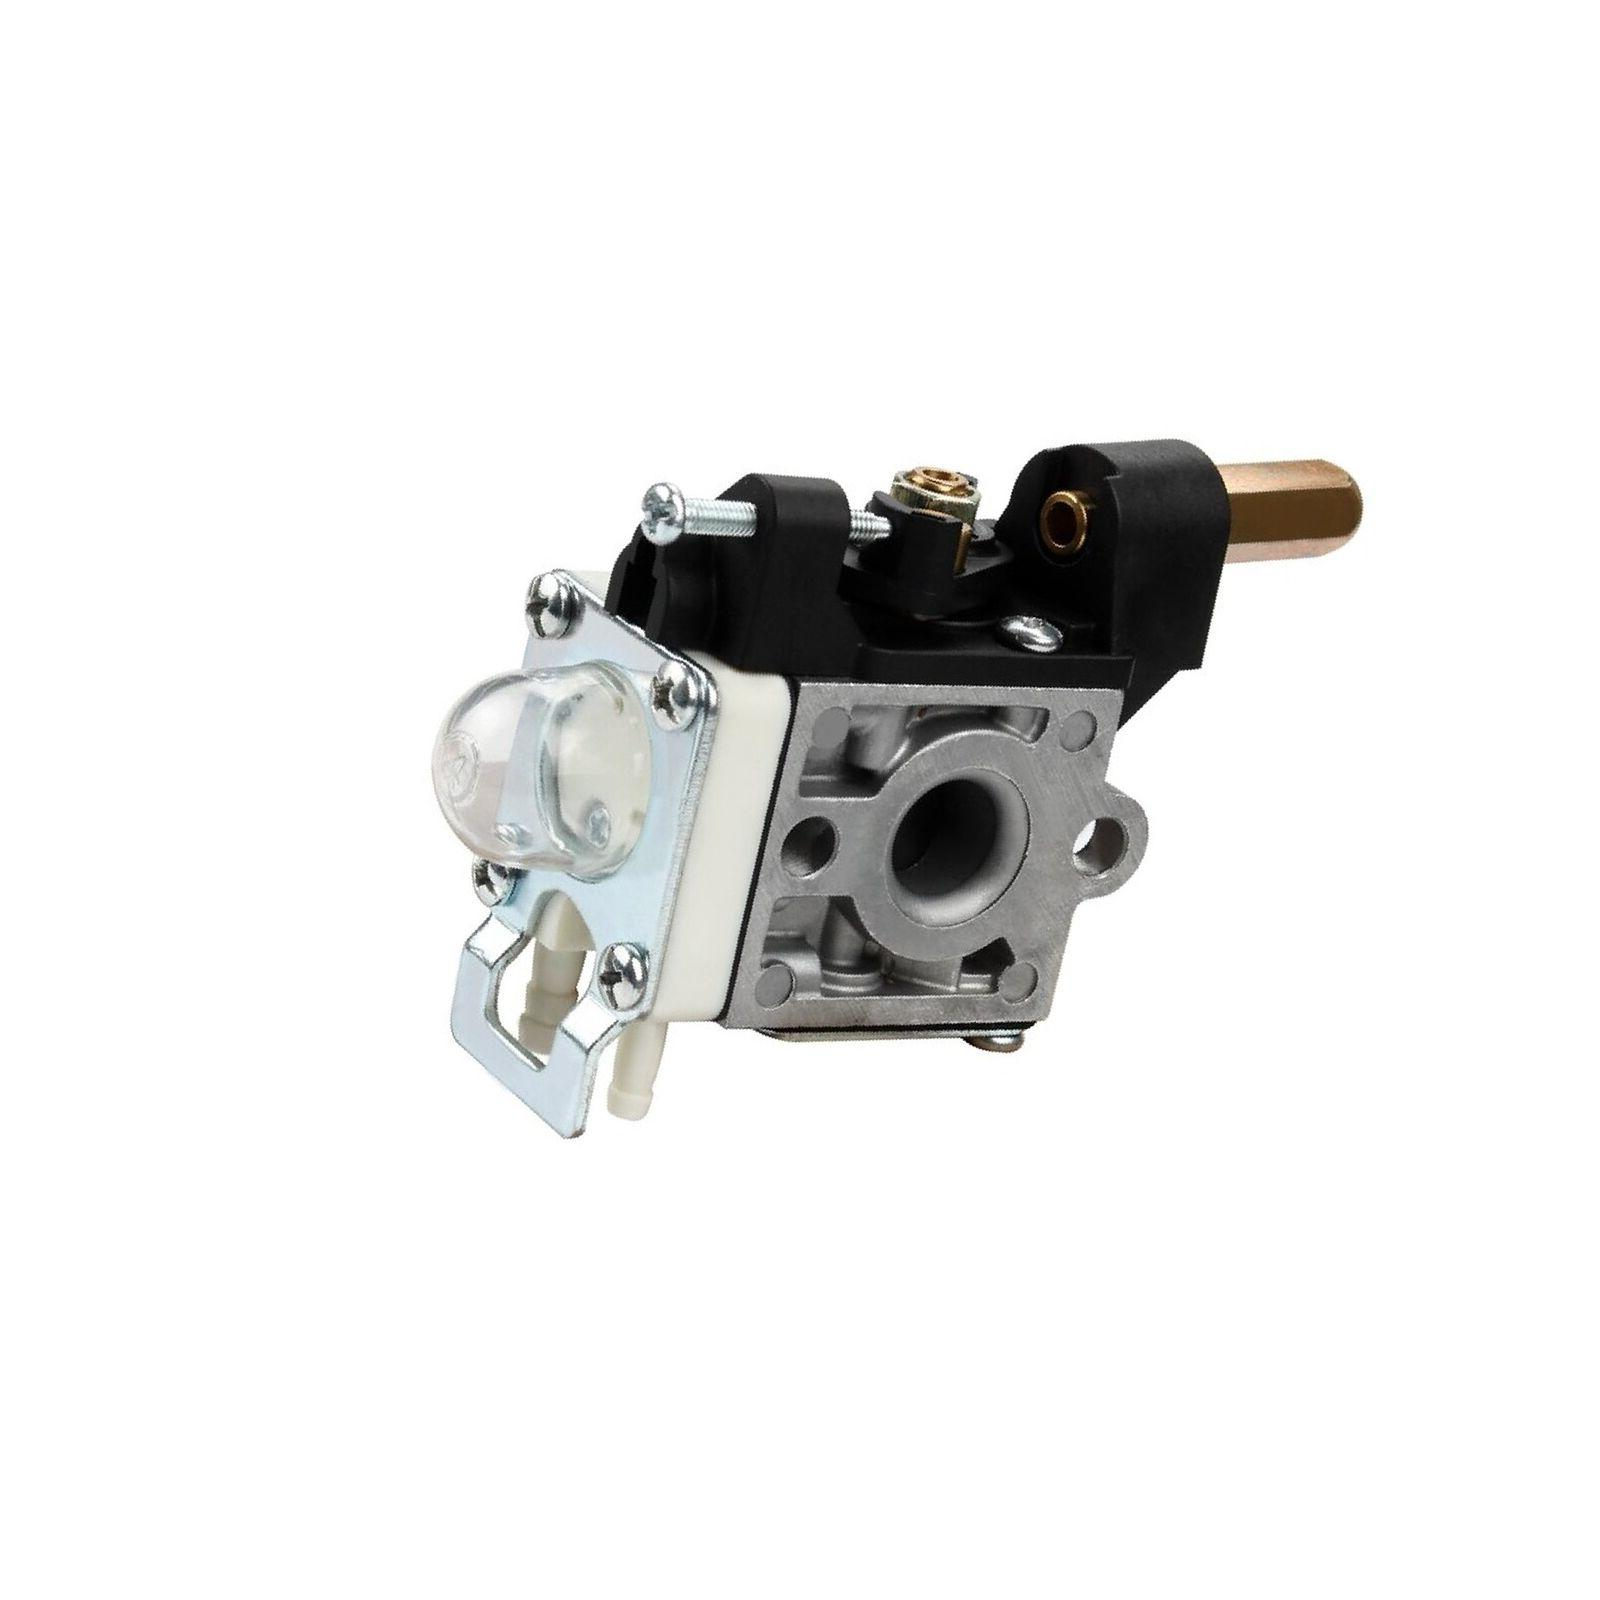 Dalom Carburetor Echo Primer Bulb Echo trimmer